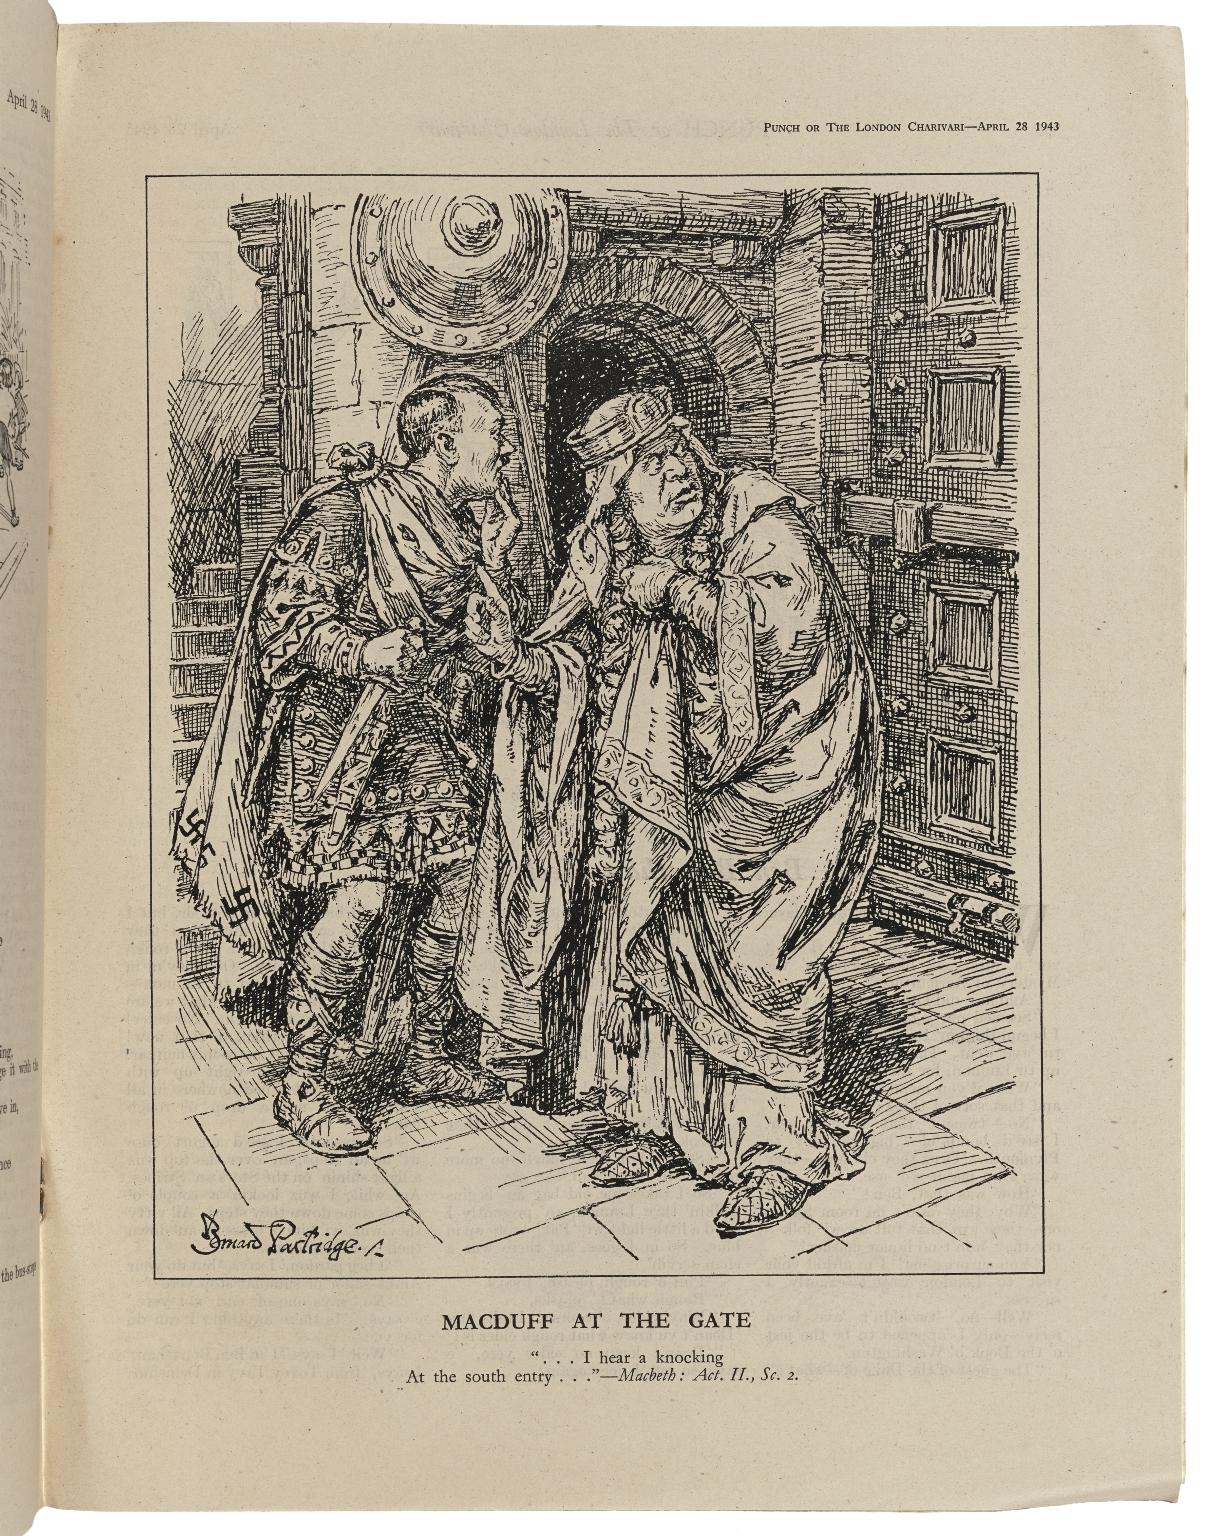 Macduff at the gate [graphic]